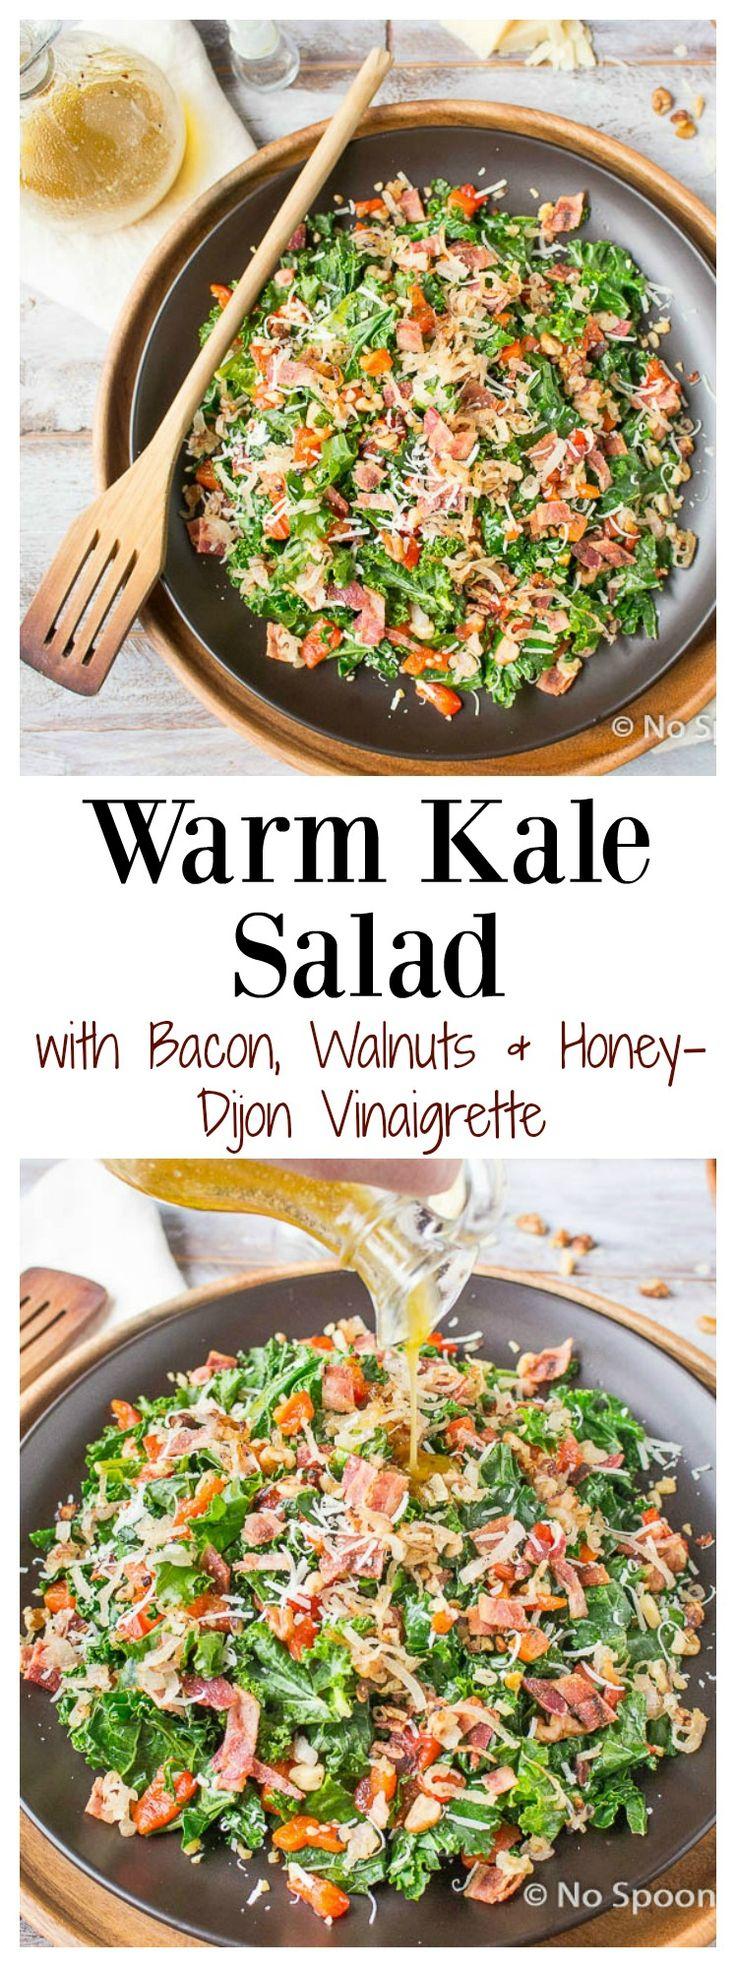 Warm Kale Salad with Crispy Shallots, Bacon, Walnuts, Roasted Red Peppers, Parmesan & Honey-Dijon Vinaigrette